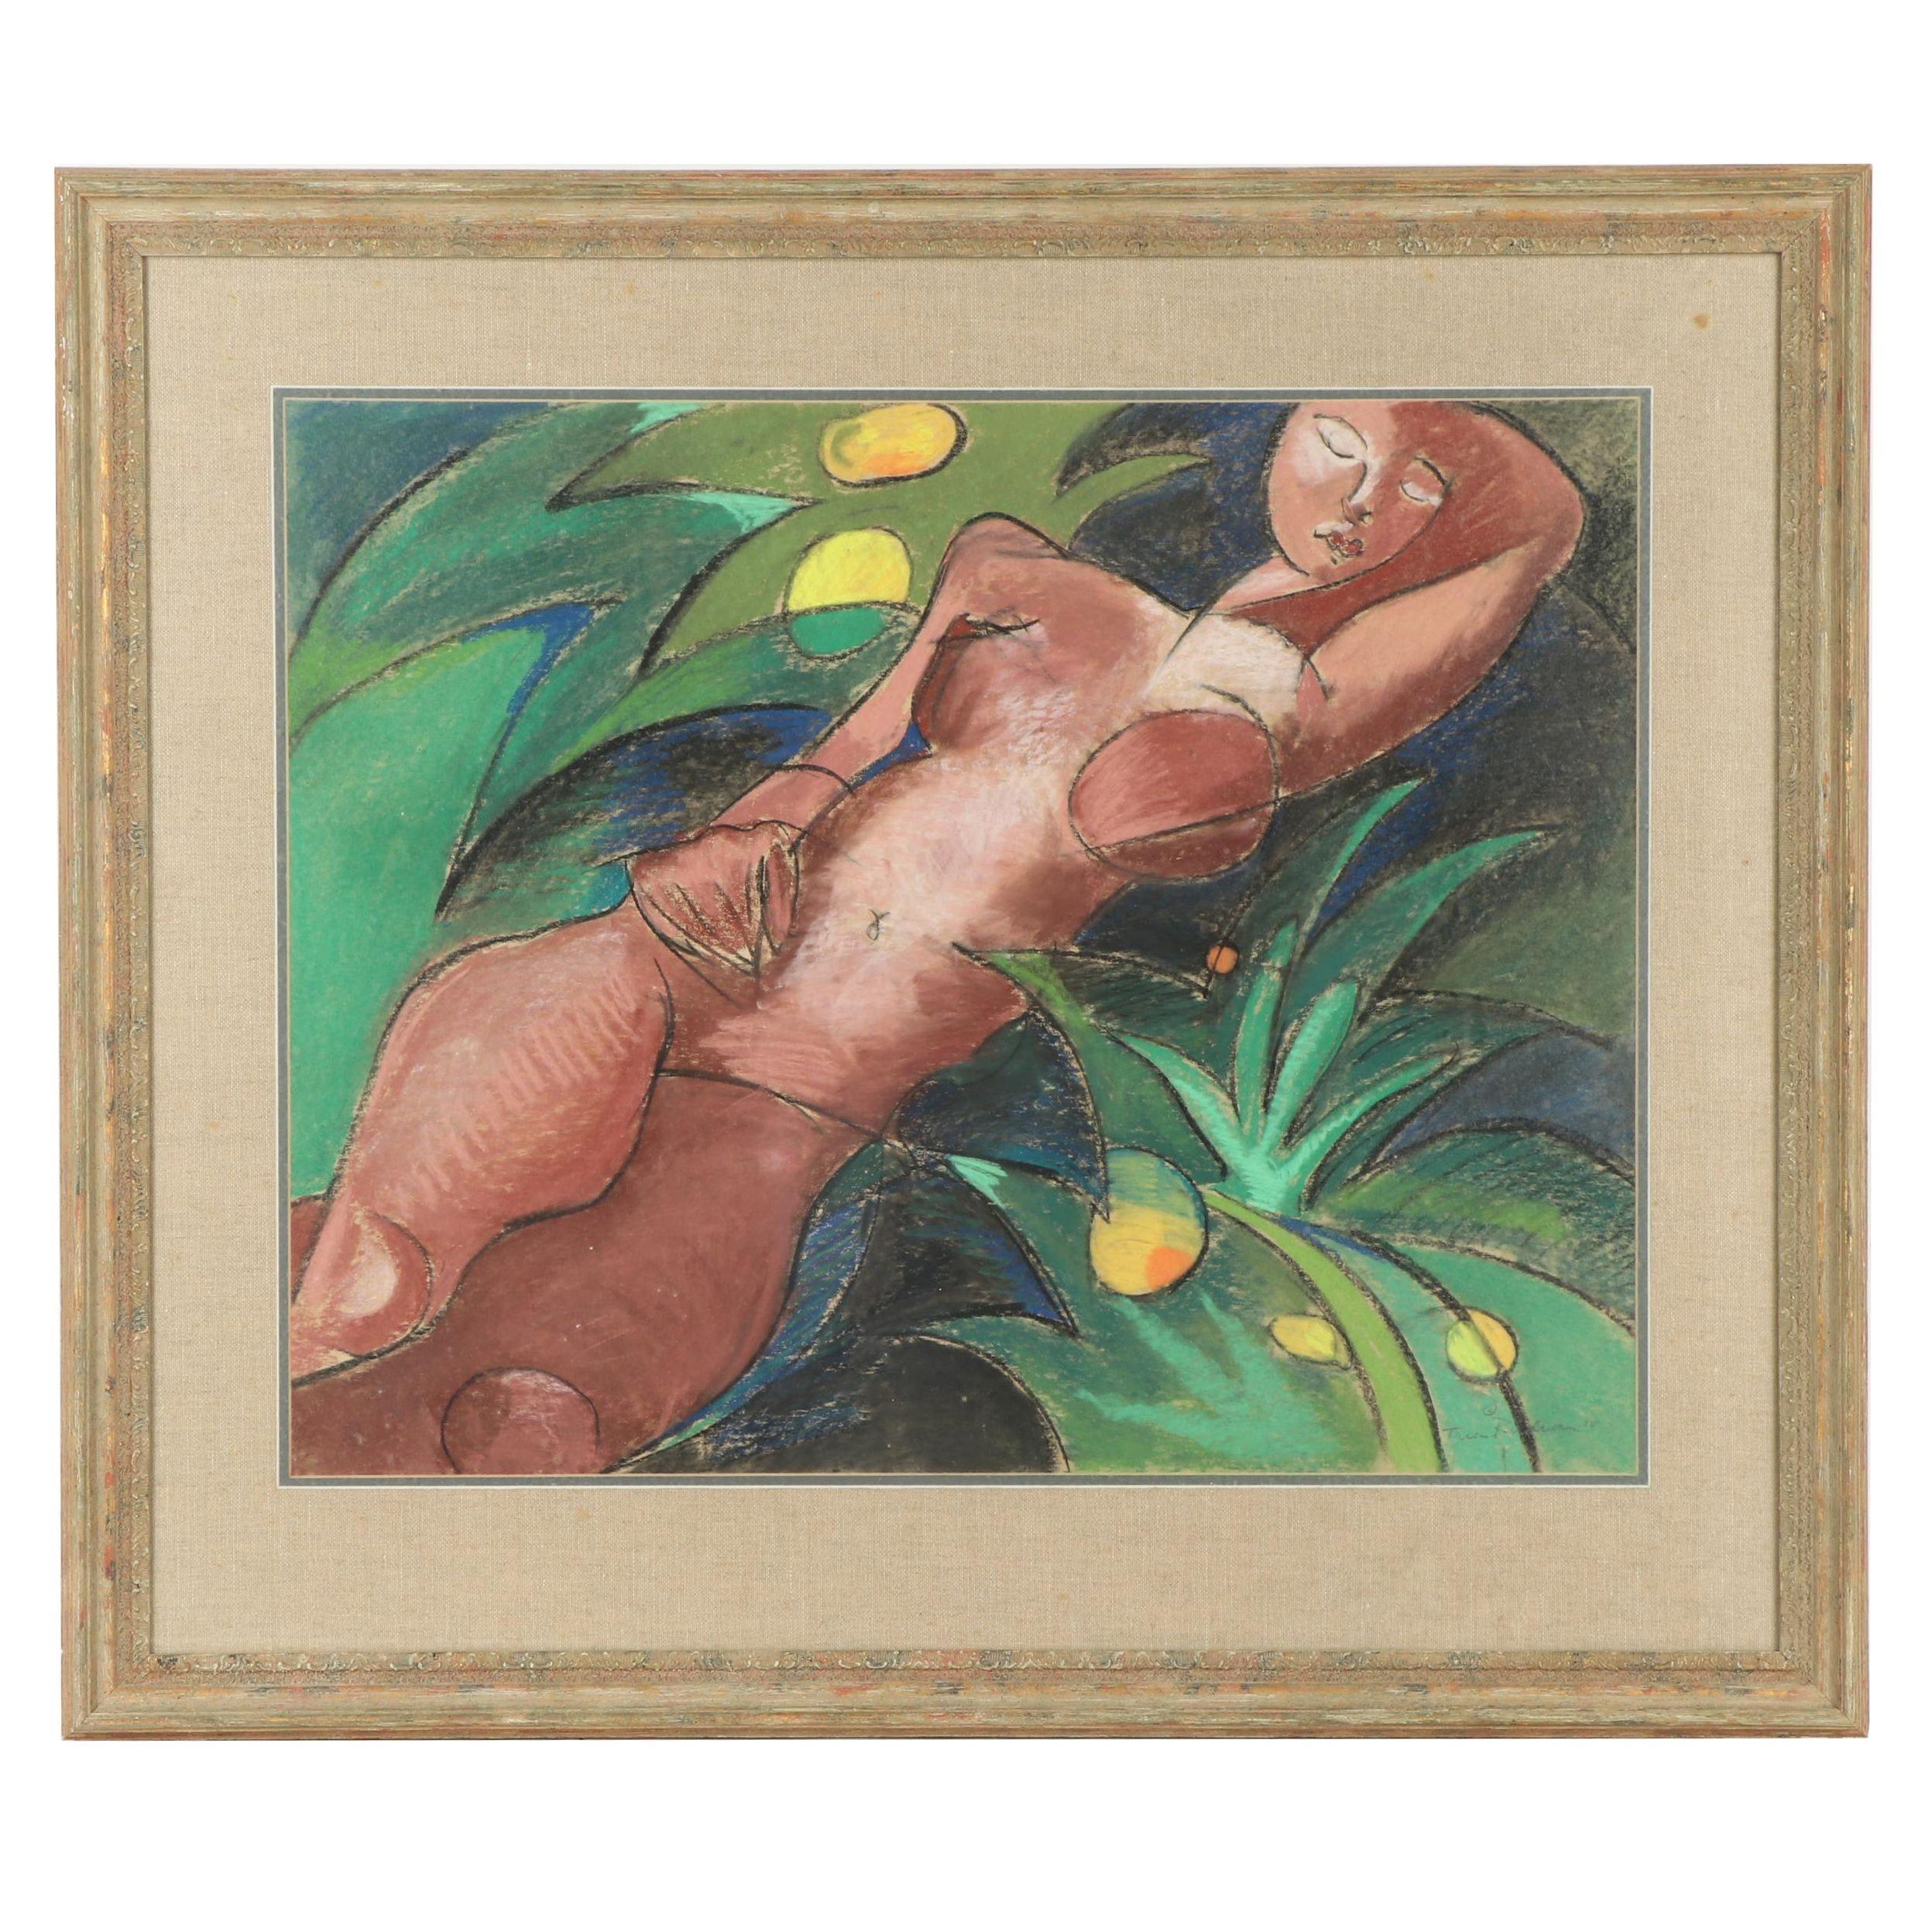 Cubist Style Pastel Portrait of a Female Nude, 1990